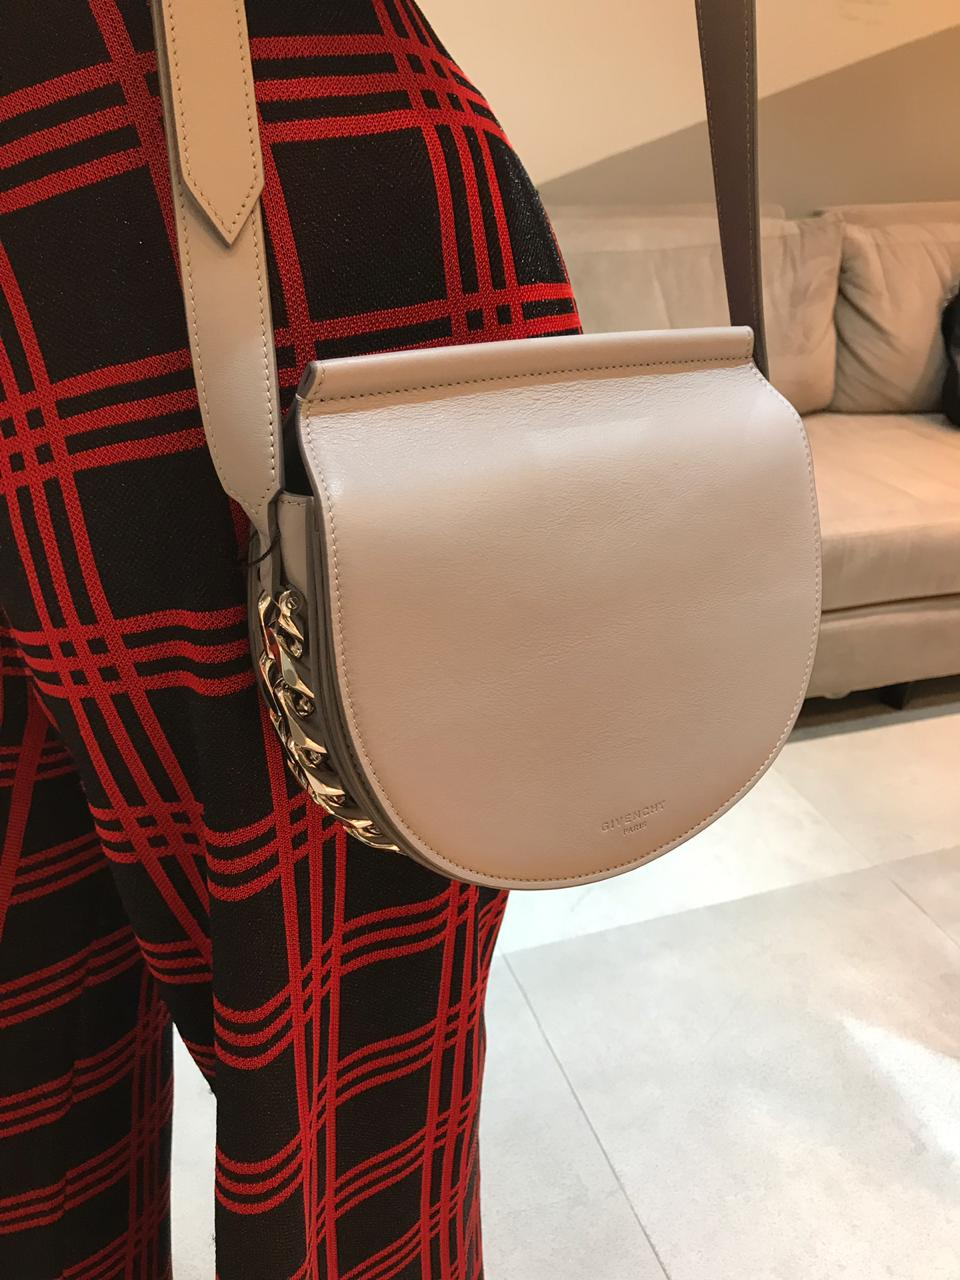 Bolsa Givenchy Cinza - Ref. 2808